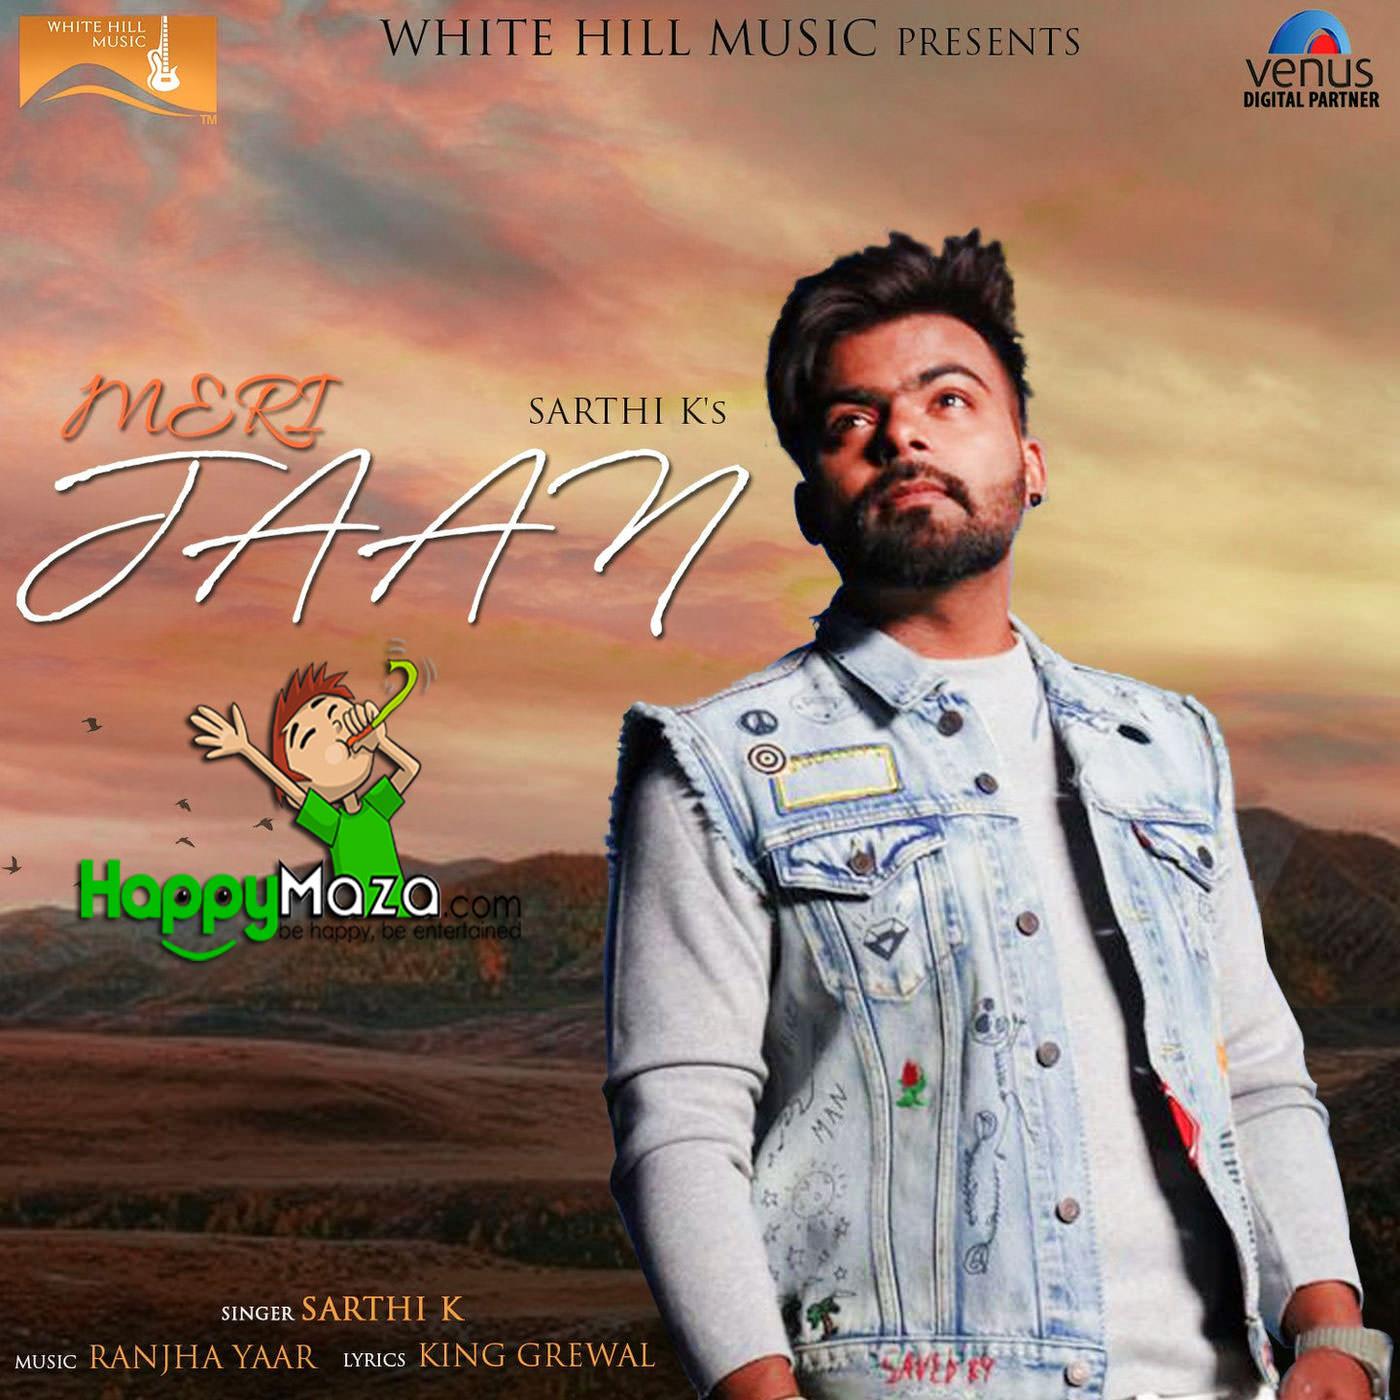 Tere Yaar Bathere Ne Song: Meri Jaan Lyrics - Sarthi K - 2017